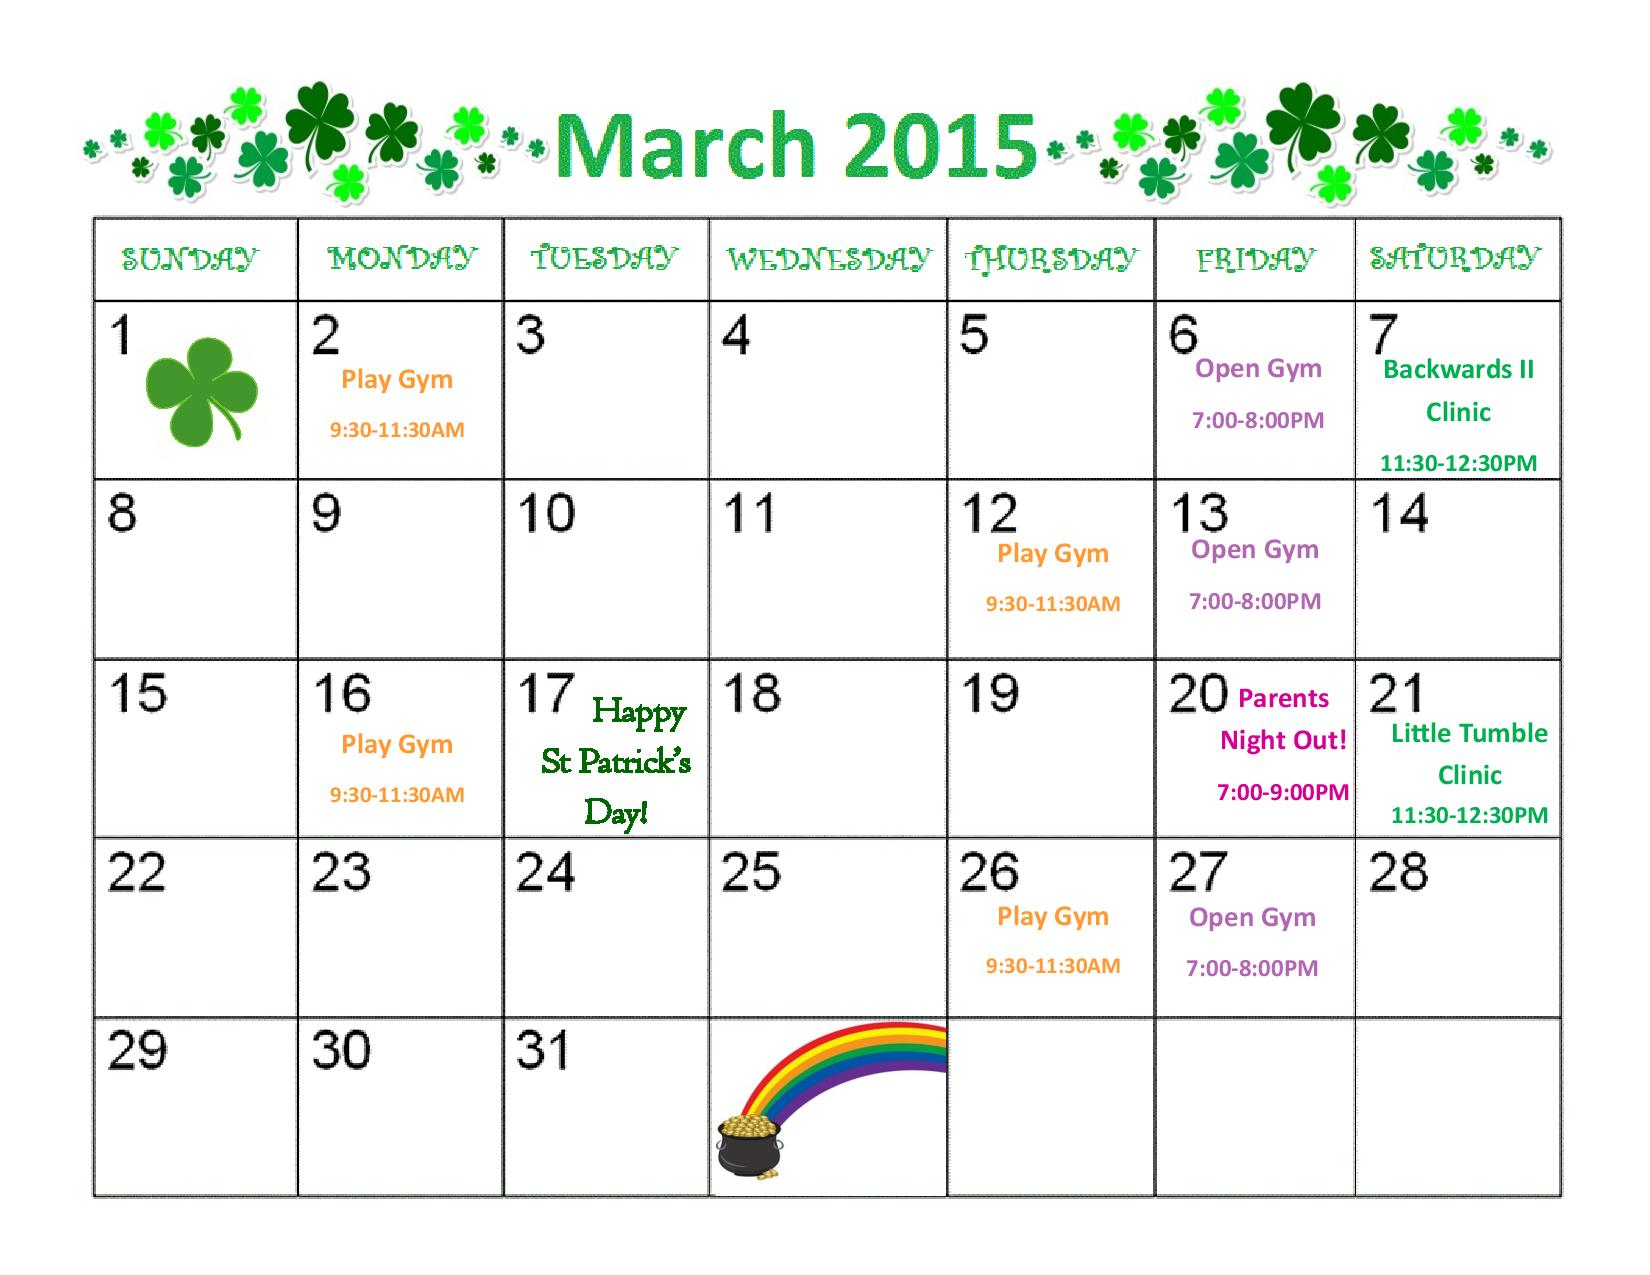 March 2015 Rotterdam Gymnastics Calendar